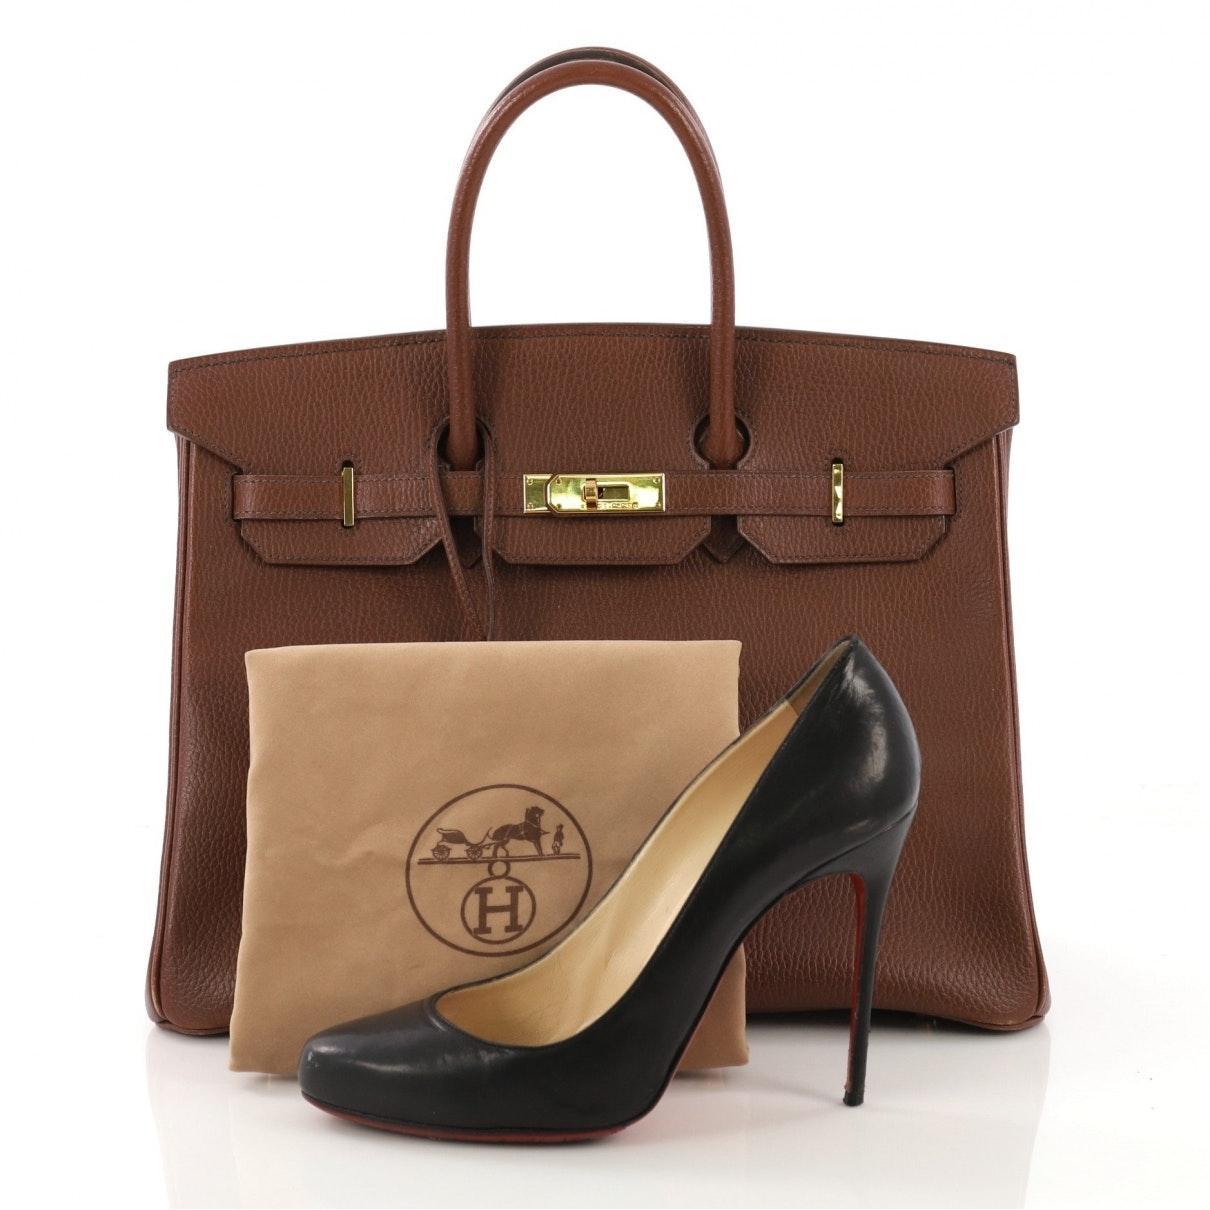 Sac à main Birkin 35 en Cuir Marron Hermès en coloris Marron zCsZ